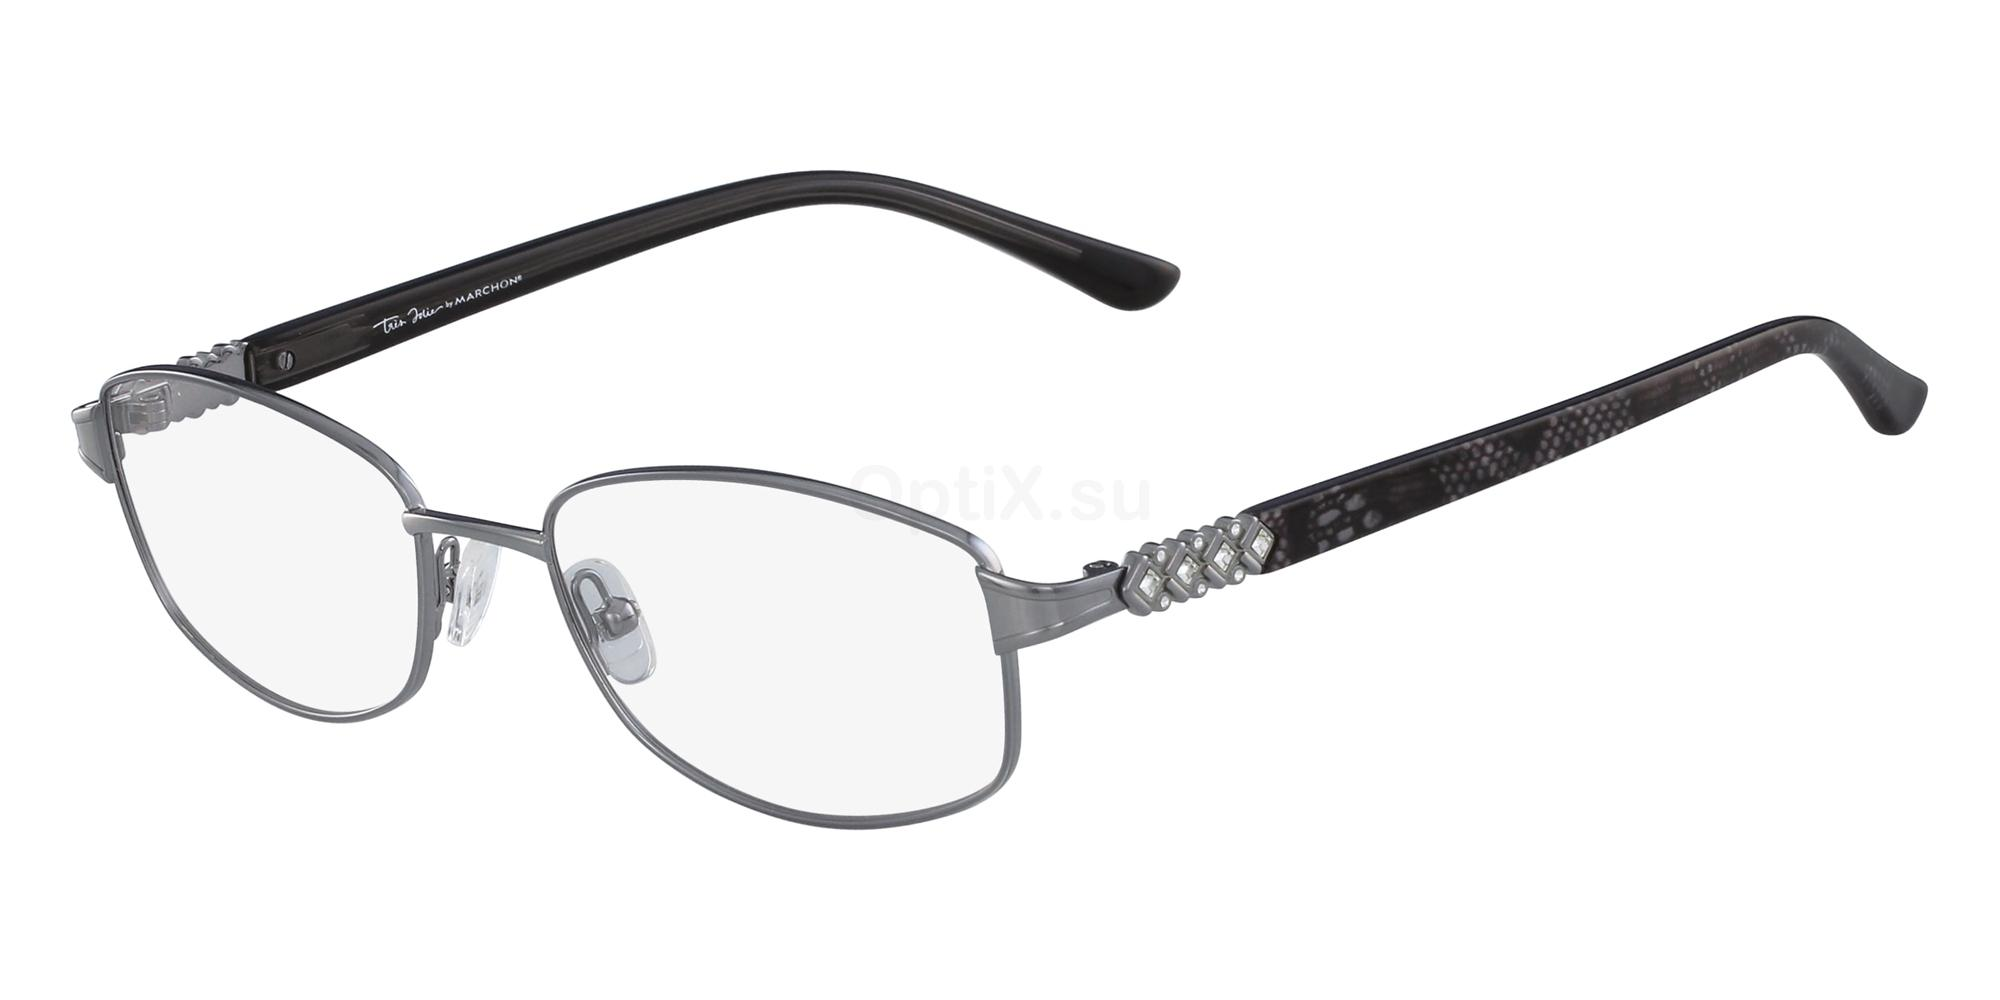 046 TRES JOLIE 177 Glasses, Tres Jolie